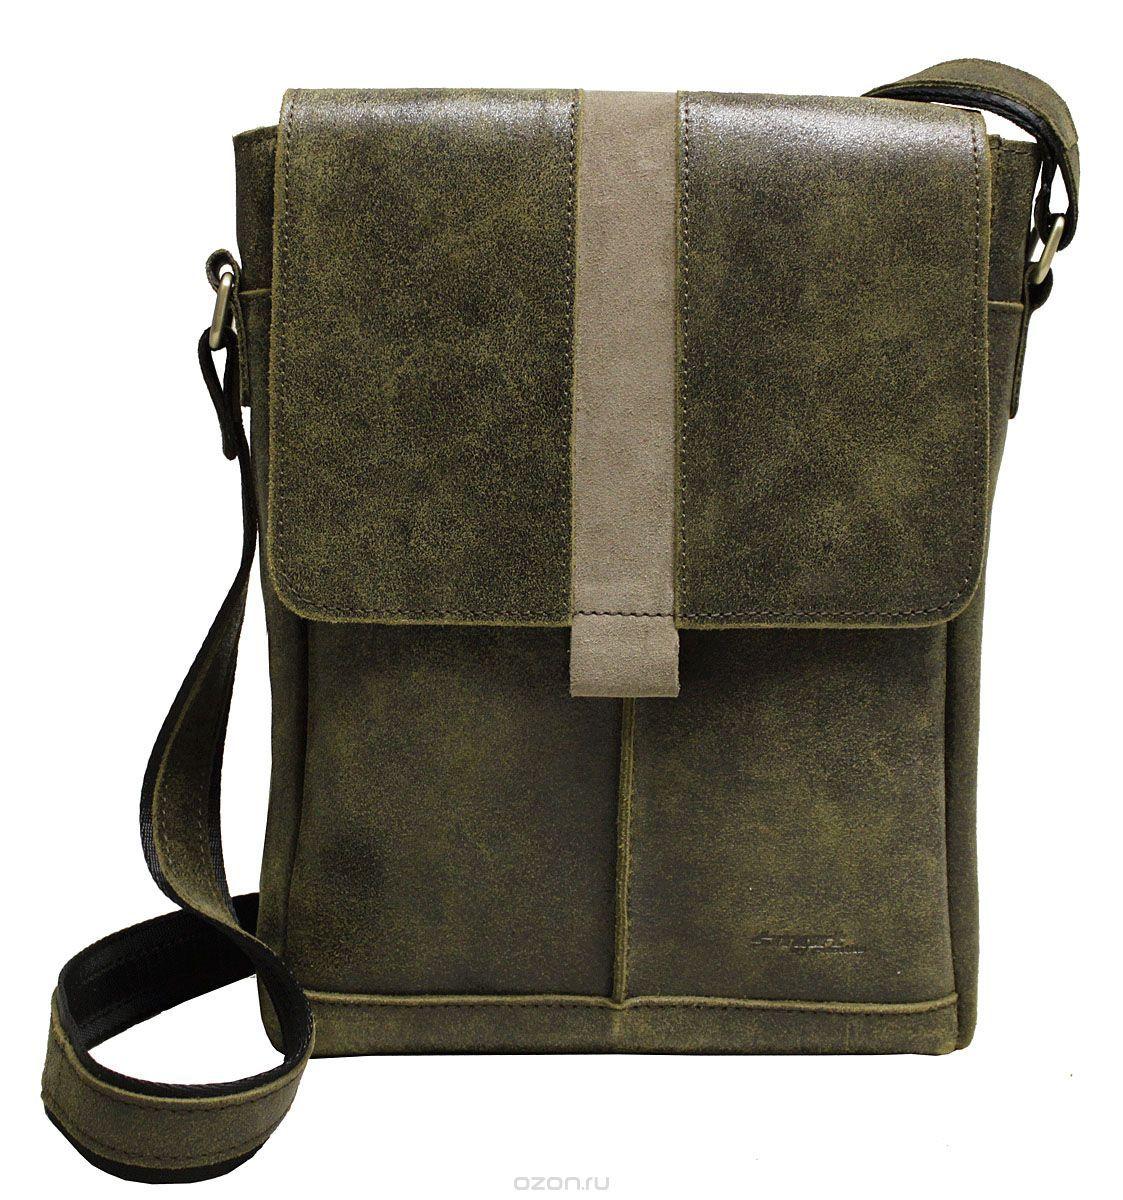 bb9de3f7437d Сумка-планшет молодежная мужская Edmins Smart by Edmins, цвет  зеленый.  13С626КОЗ -